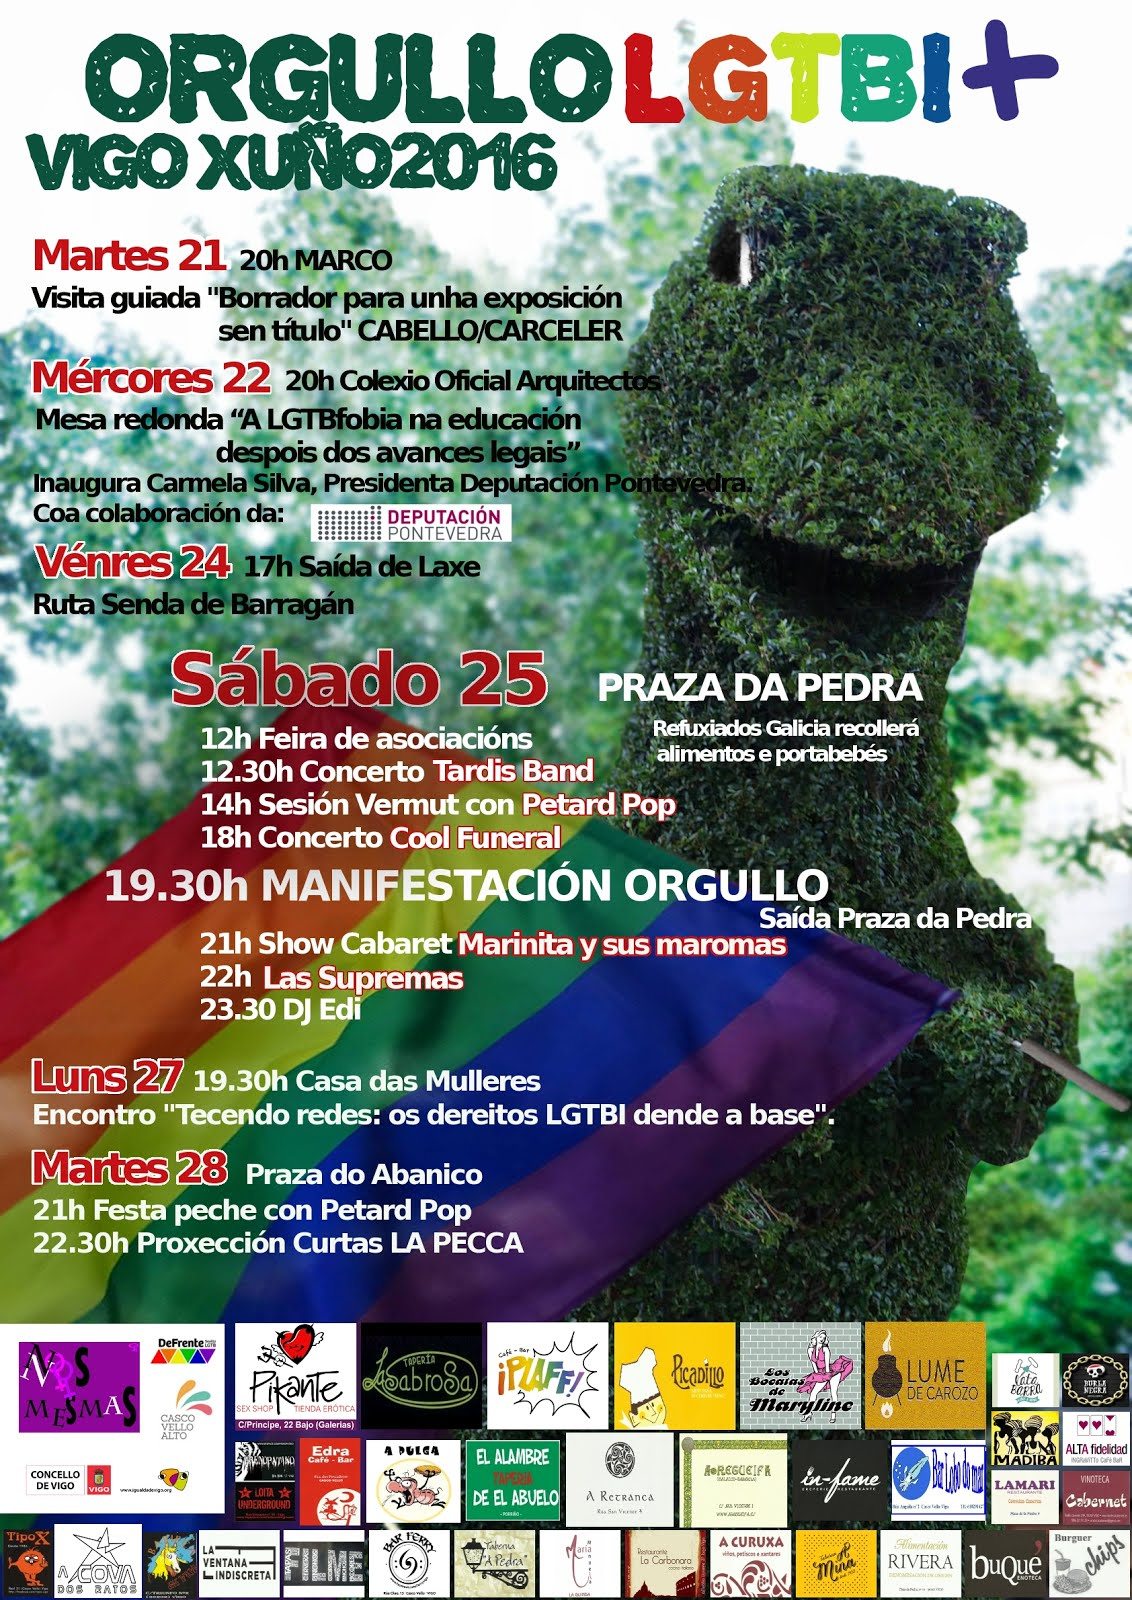 Orgullo LGTBI Vigo 2016